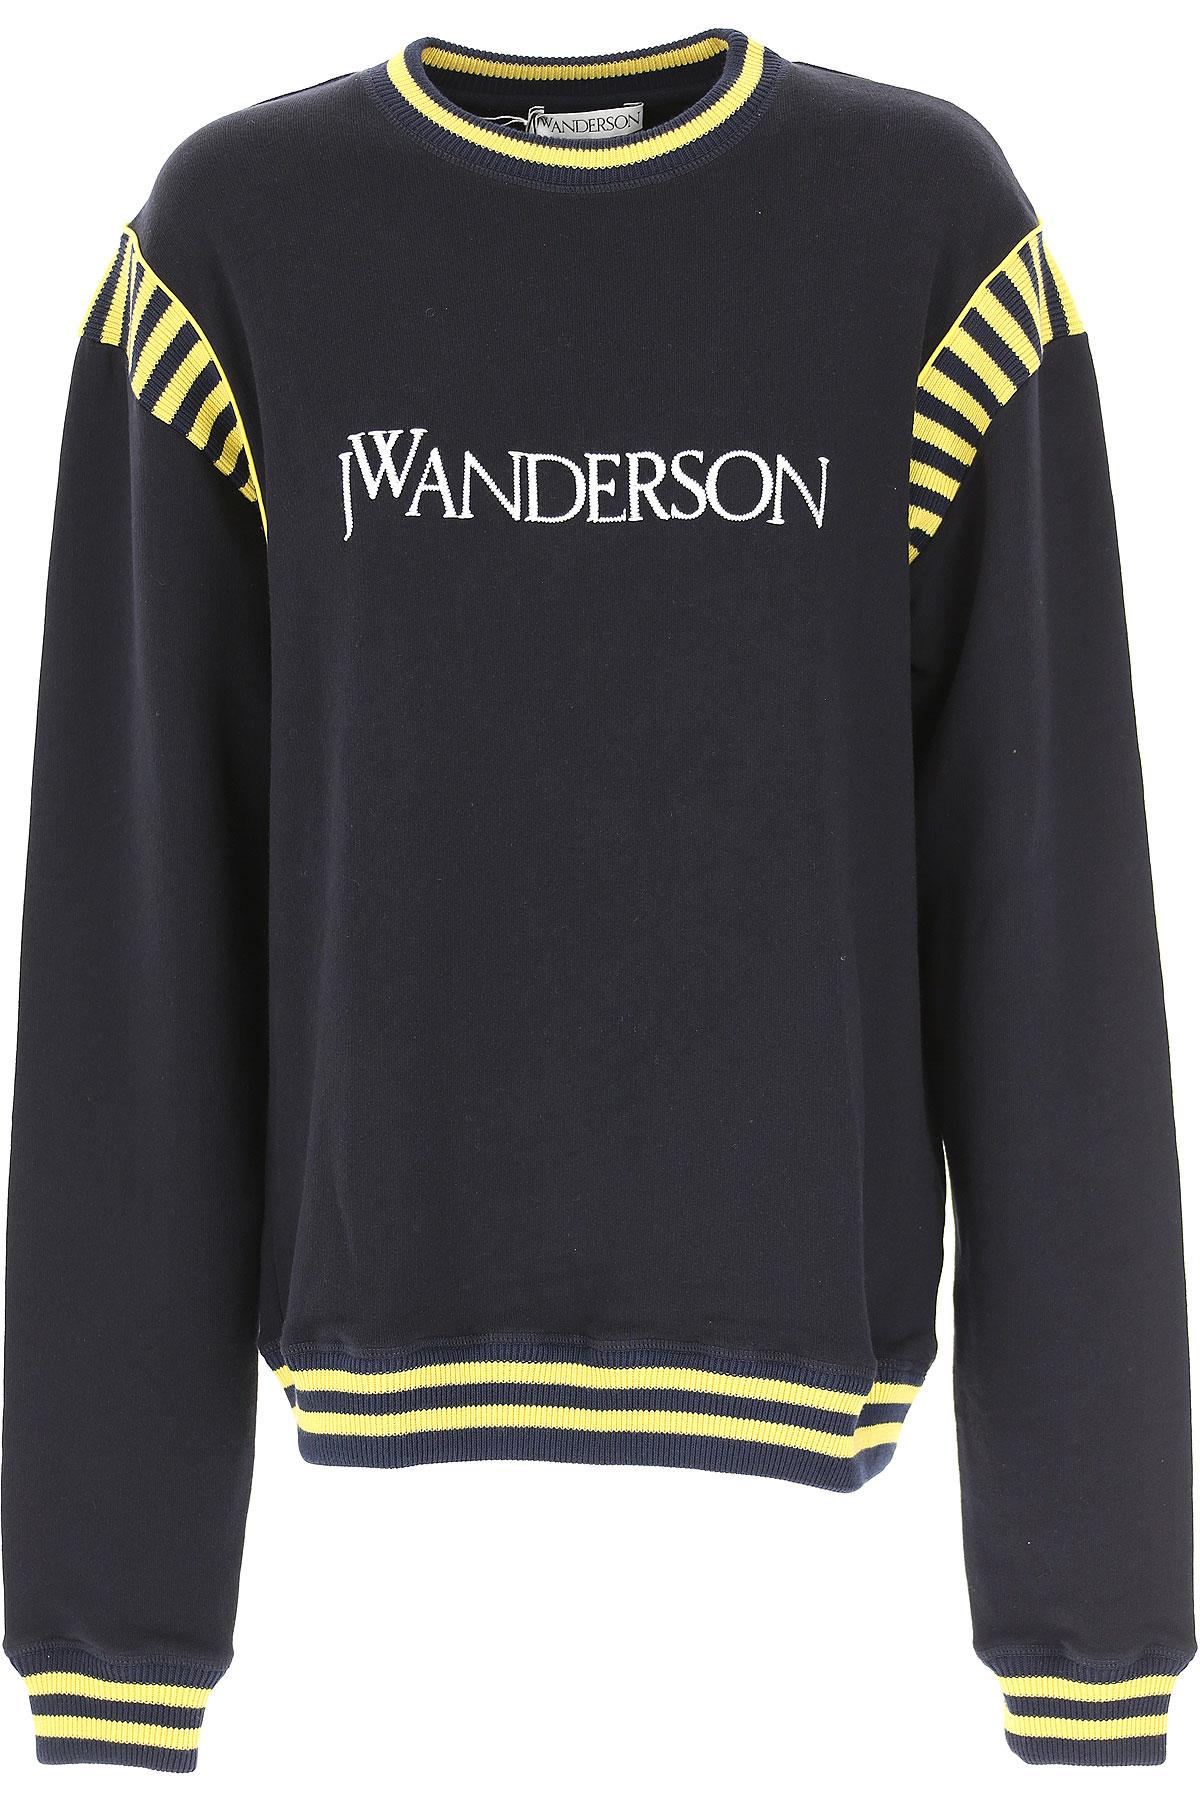 Image of J.W.Anderson Sweatshirt for Women, Navy Blue, Cotton, 2017, 10 4 6 8